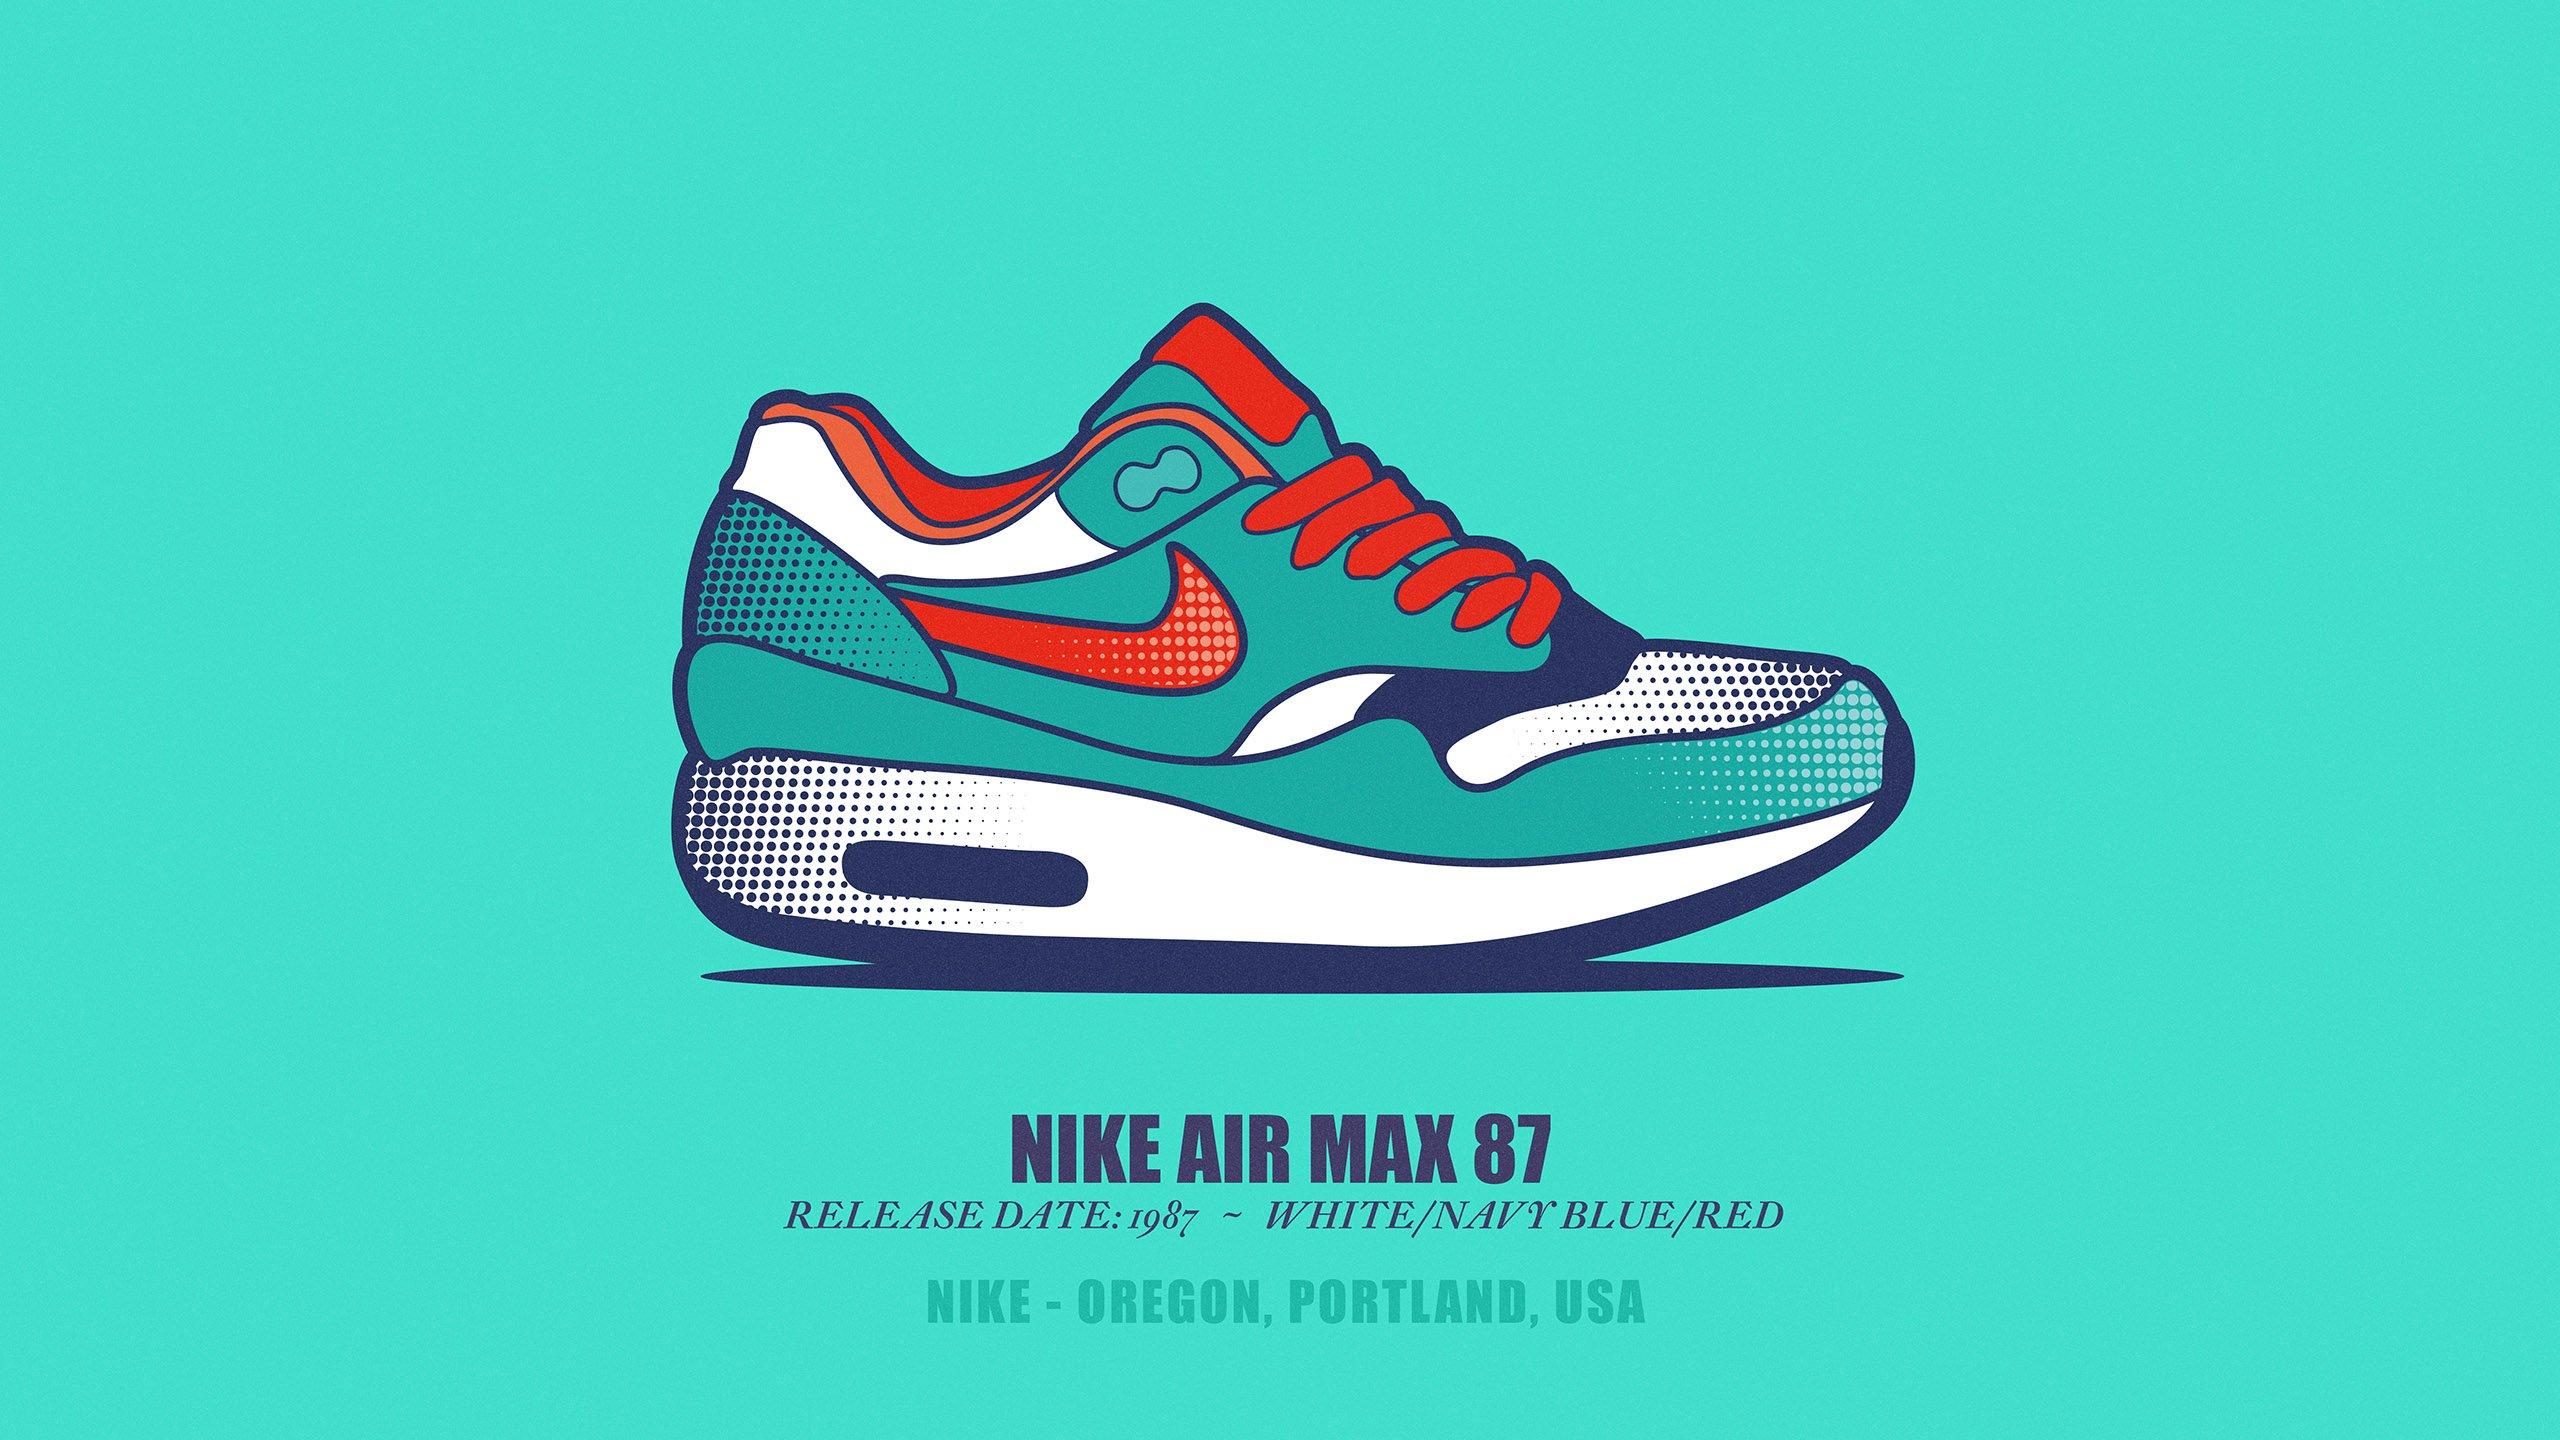 2048x2048 Playerunknowns Battlegrounds 1080p Ipad Air Hd: Nike IPad Wallpaper